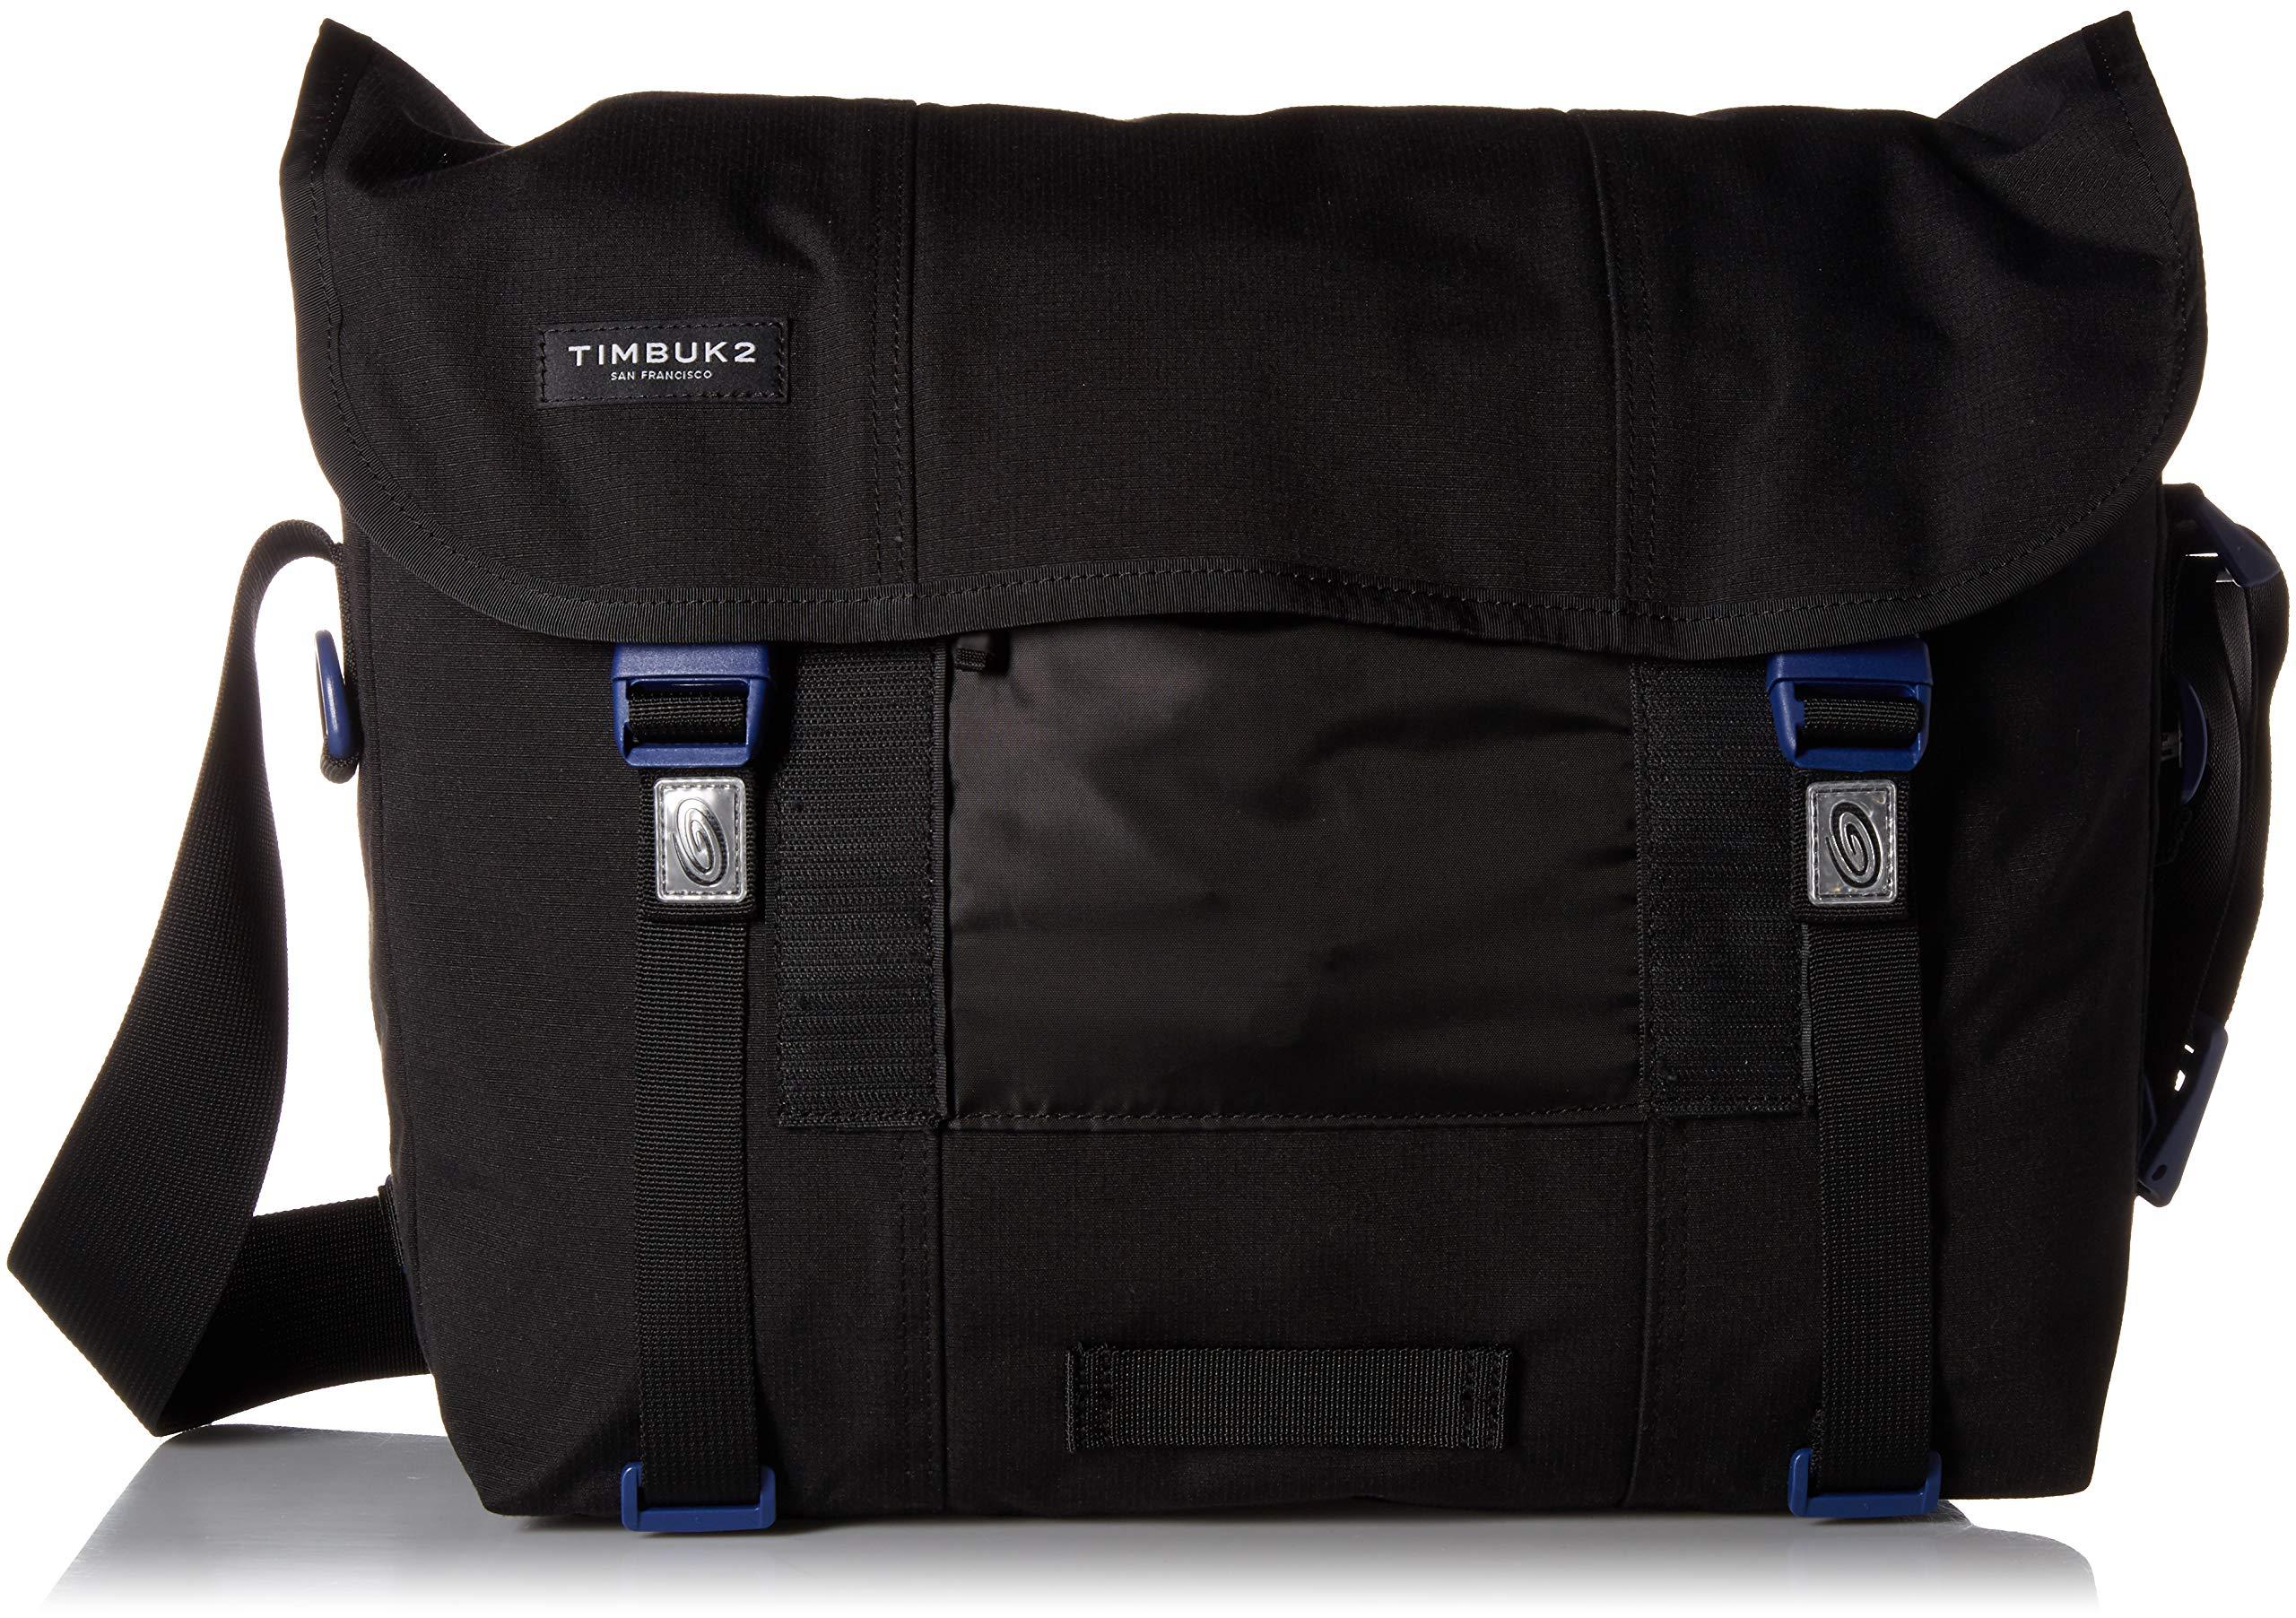 Timbuk2 Flight Classic Messenger Bag, Jet Black/Blue Wish, XS, Jet Black/Blue Wish, x Small